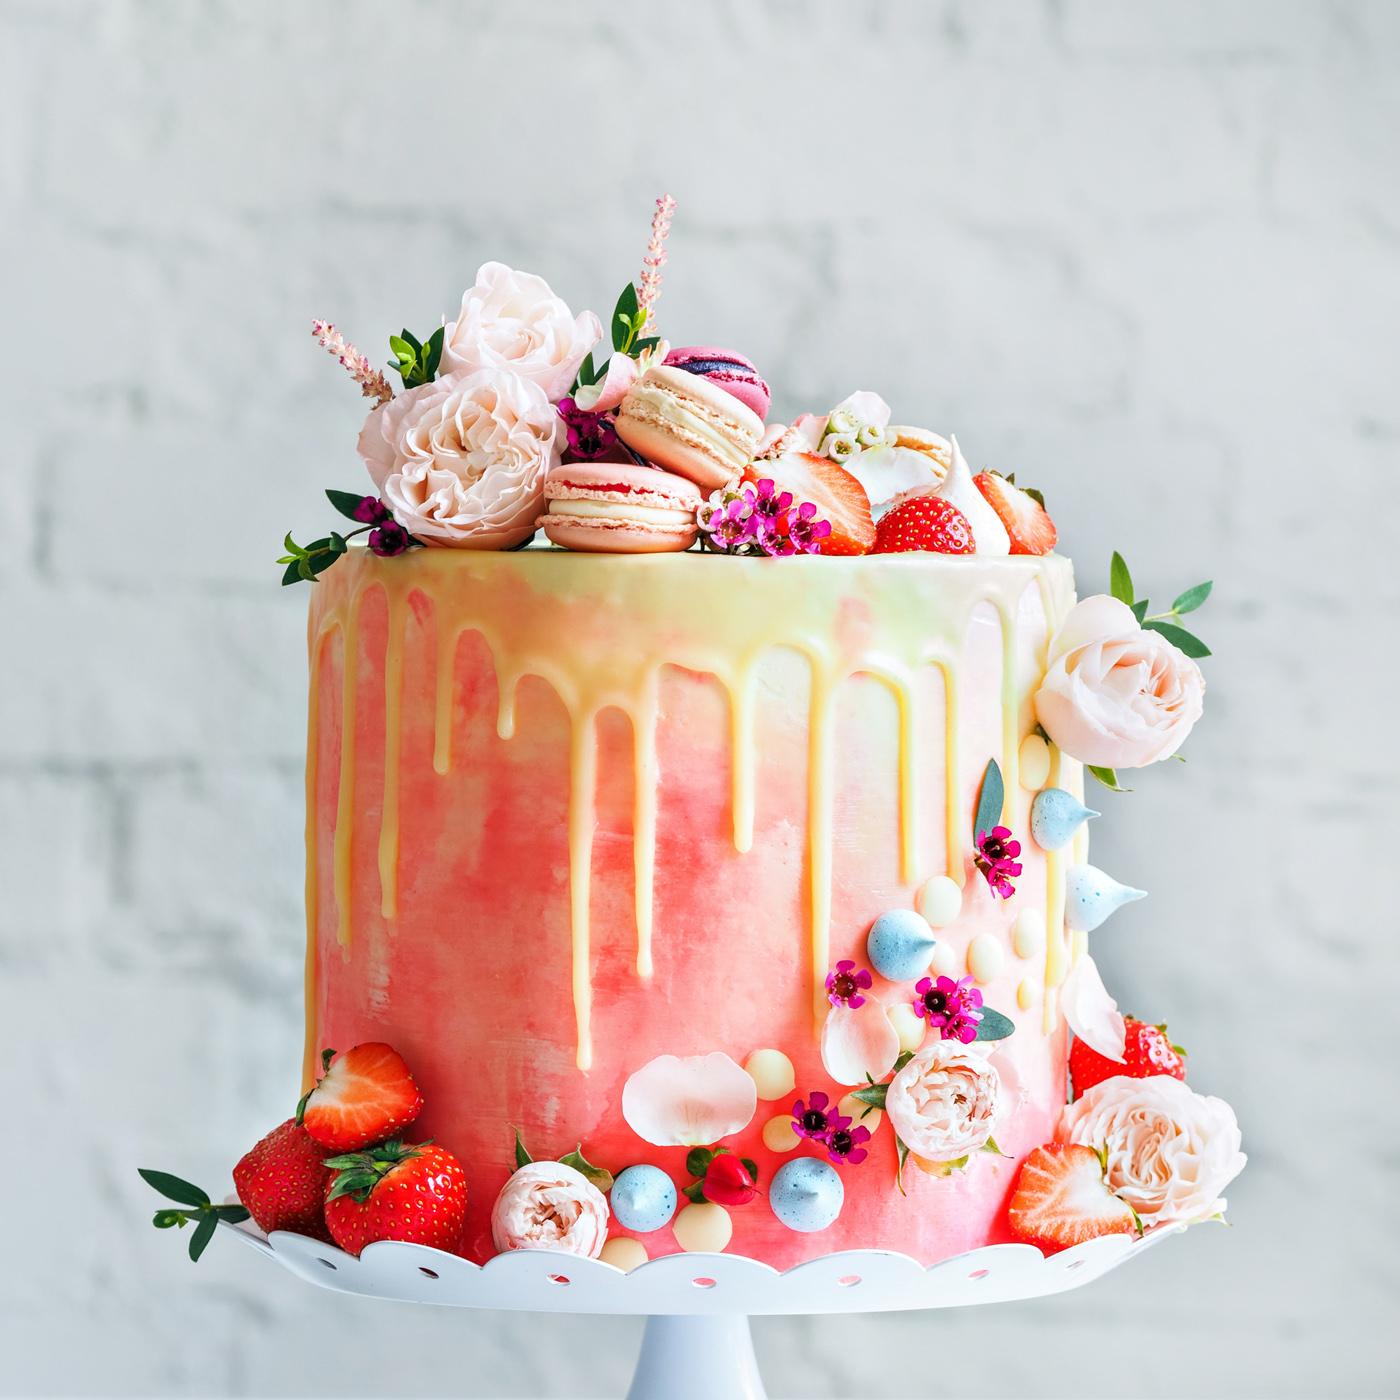 decorated_cake_1.jpg